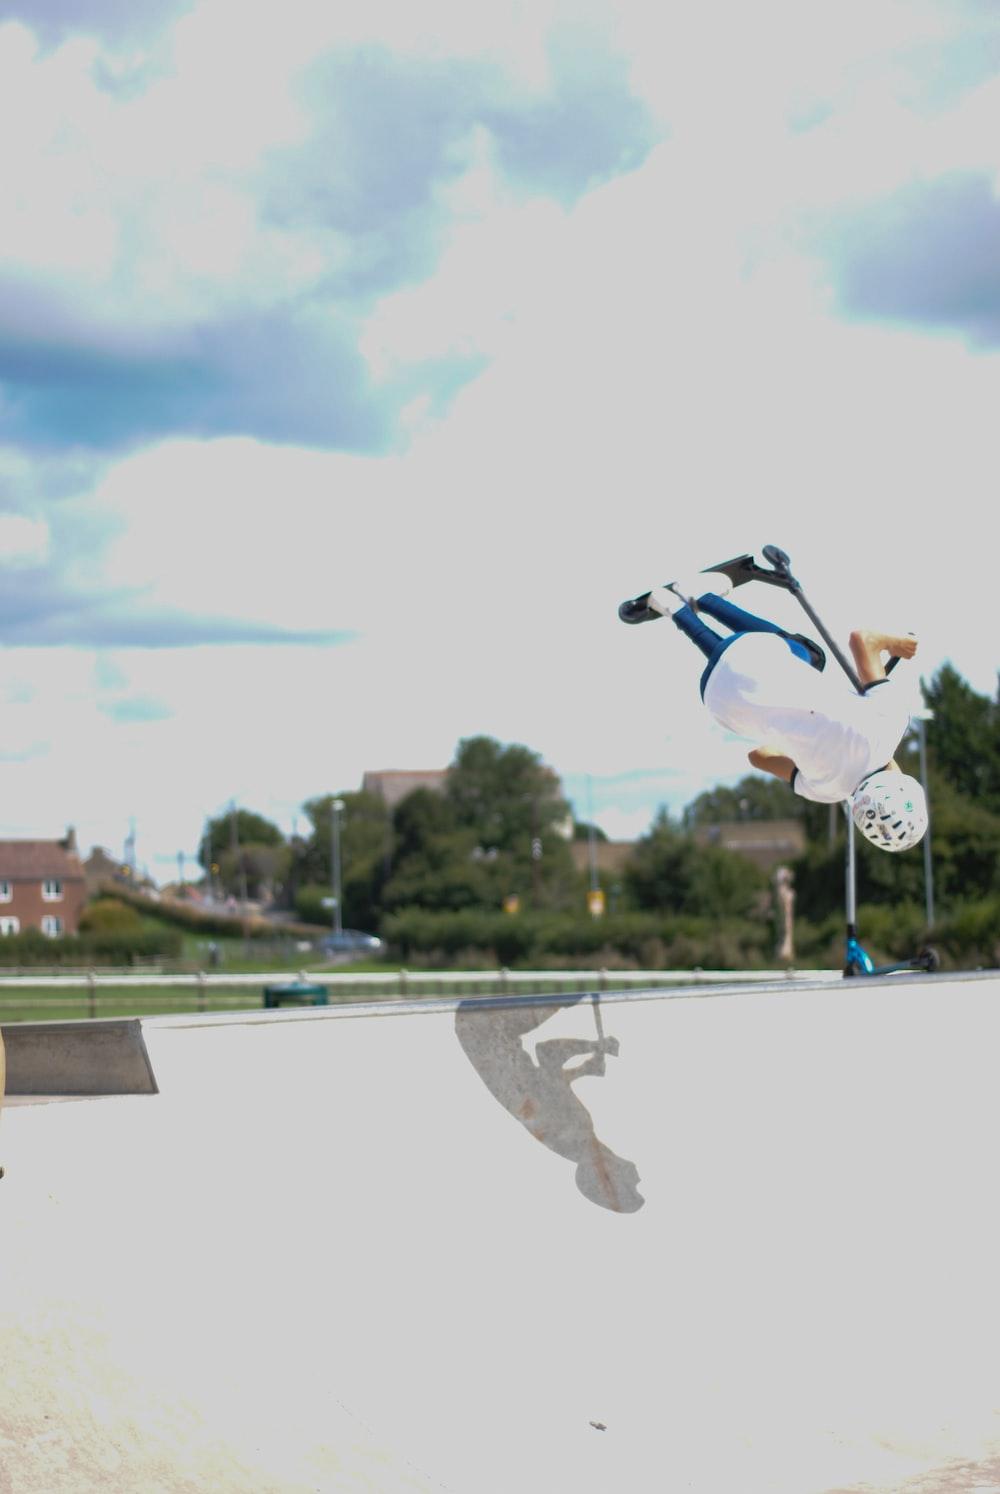 person in white t-shirt skateboarding at the skate park